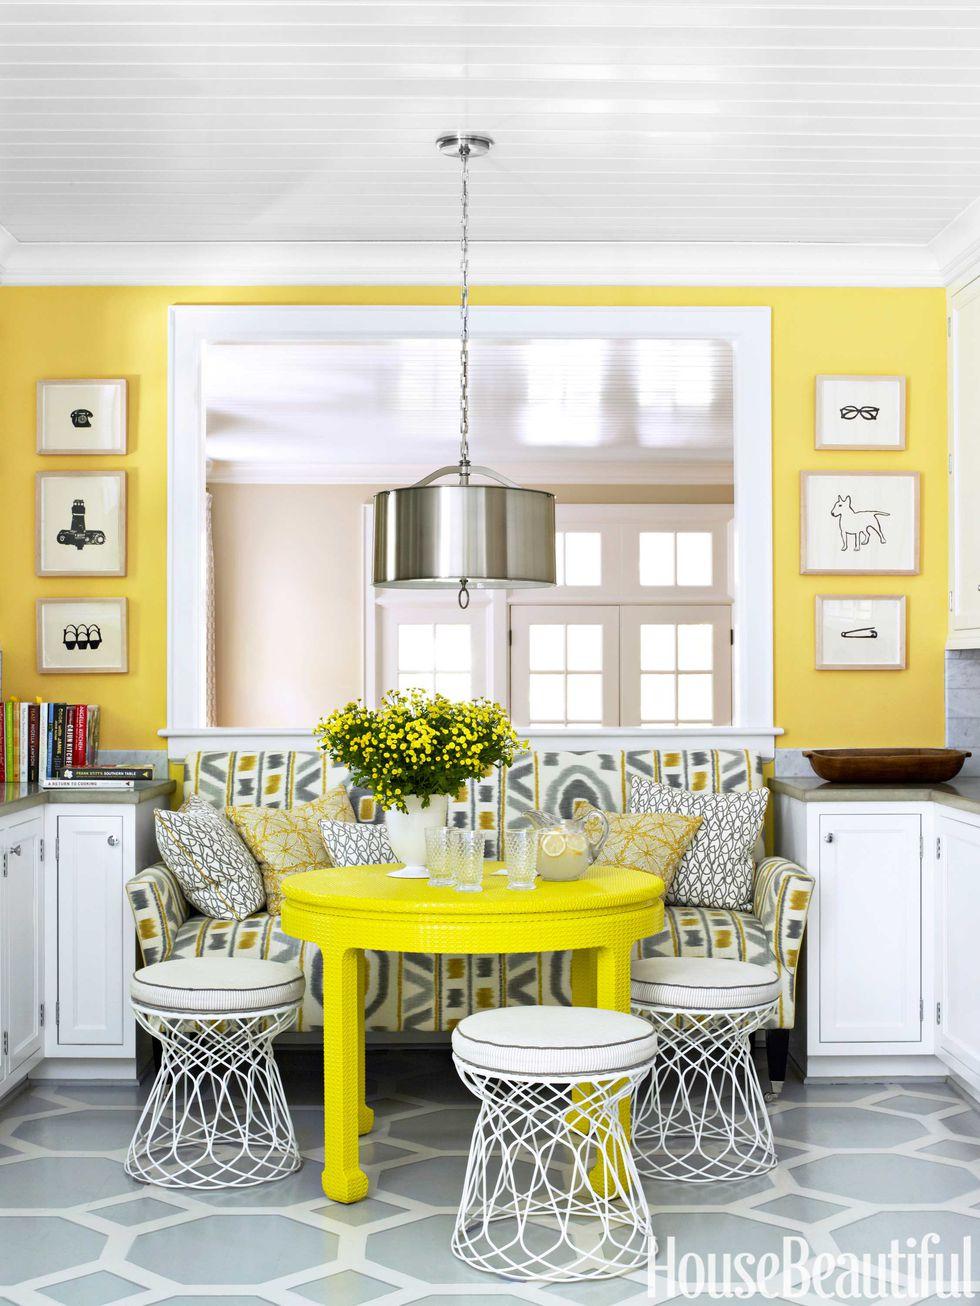 Lindsay Coral Harper via House Beautiful